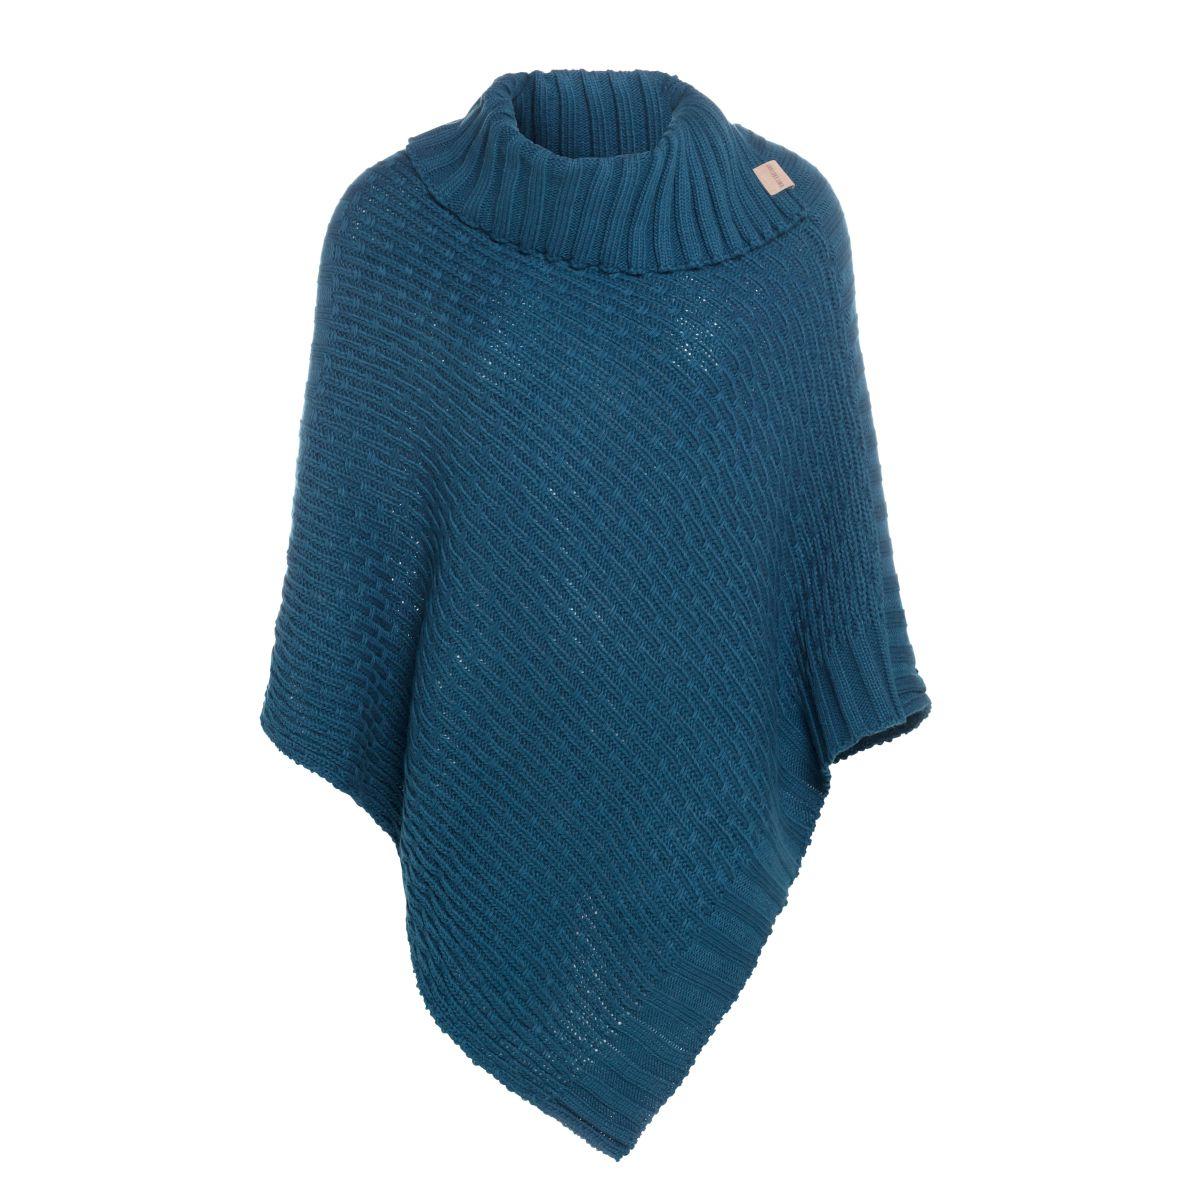 knit factory kf14806200850 nicky gebreide poncho petrol 1